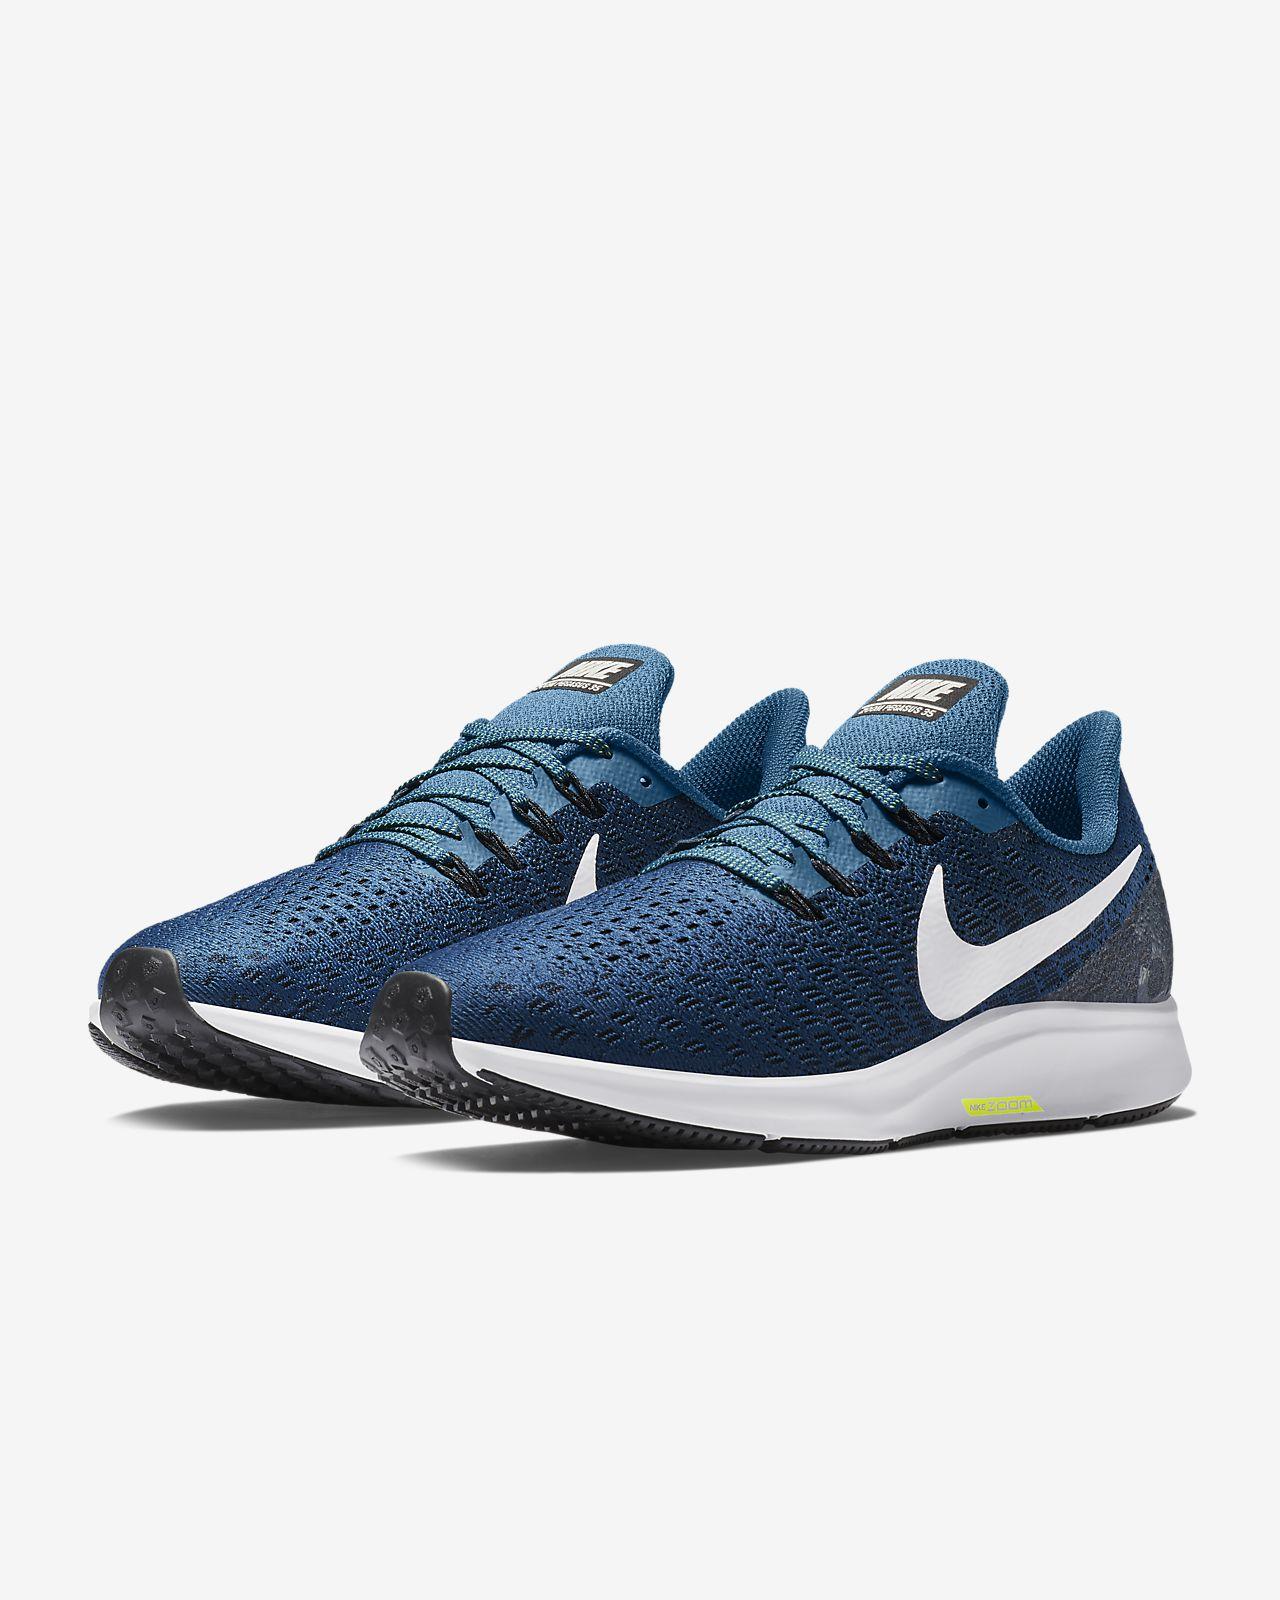 online store e1301 b8673 ... Nike Air Zoom Pegasus 35 løpesko til herre